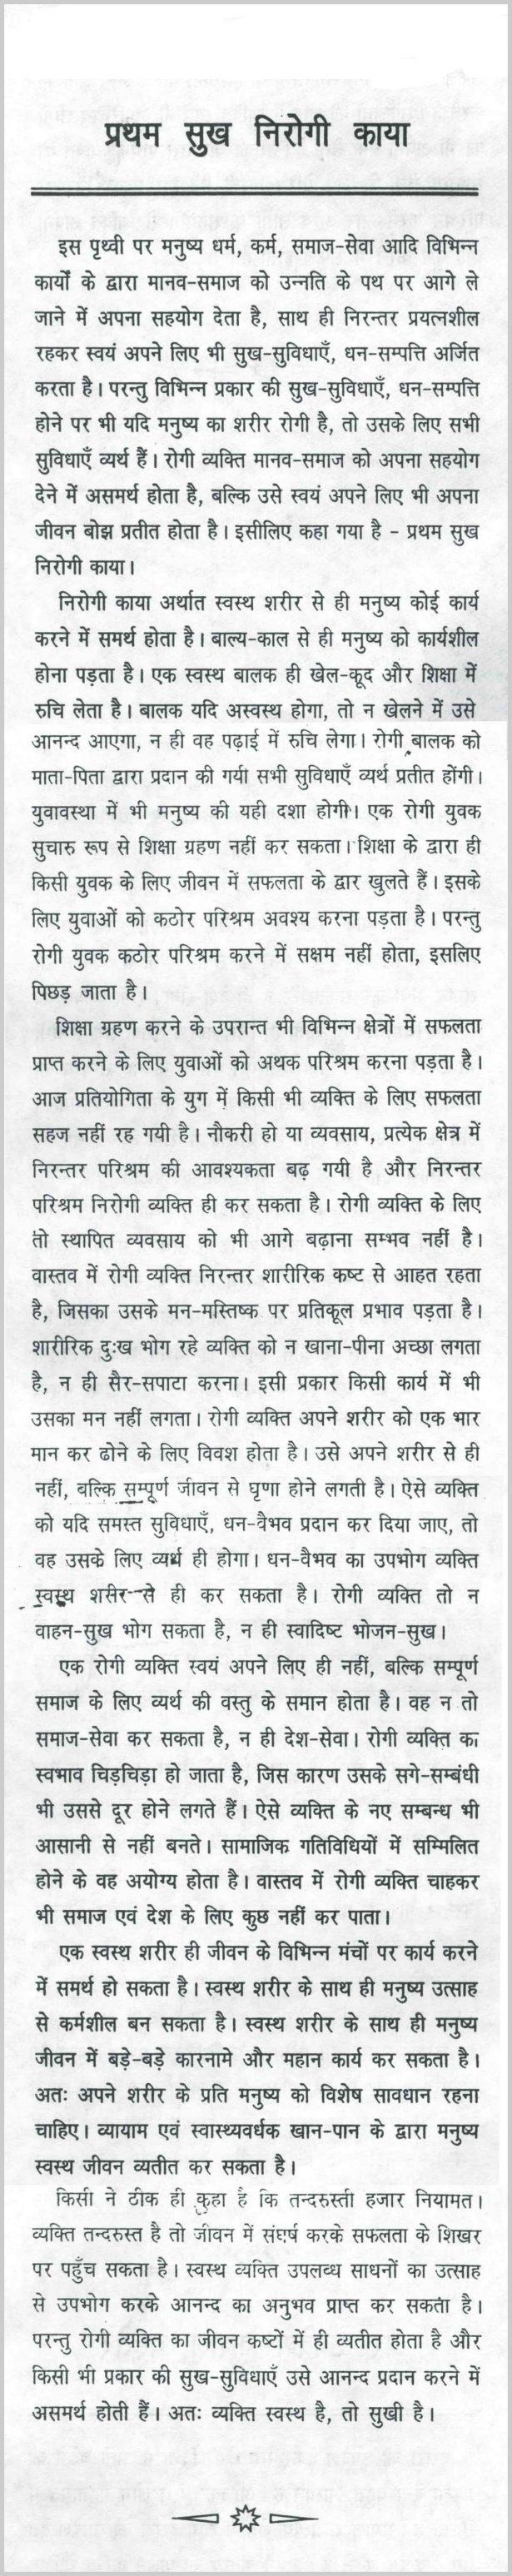 004 Essay On Adventure Sports Peter Hoffman Writing Sample Illustration 615x3094 Staggering In Hindi Ielts Full